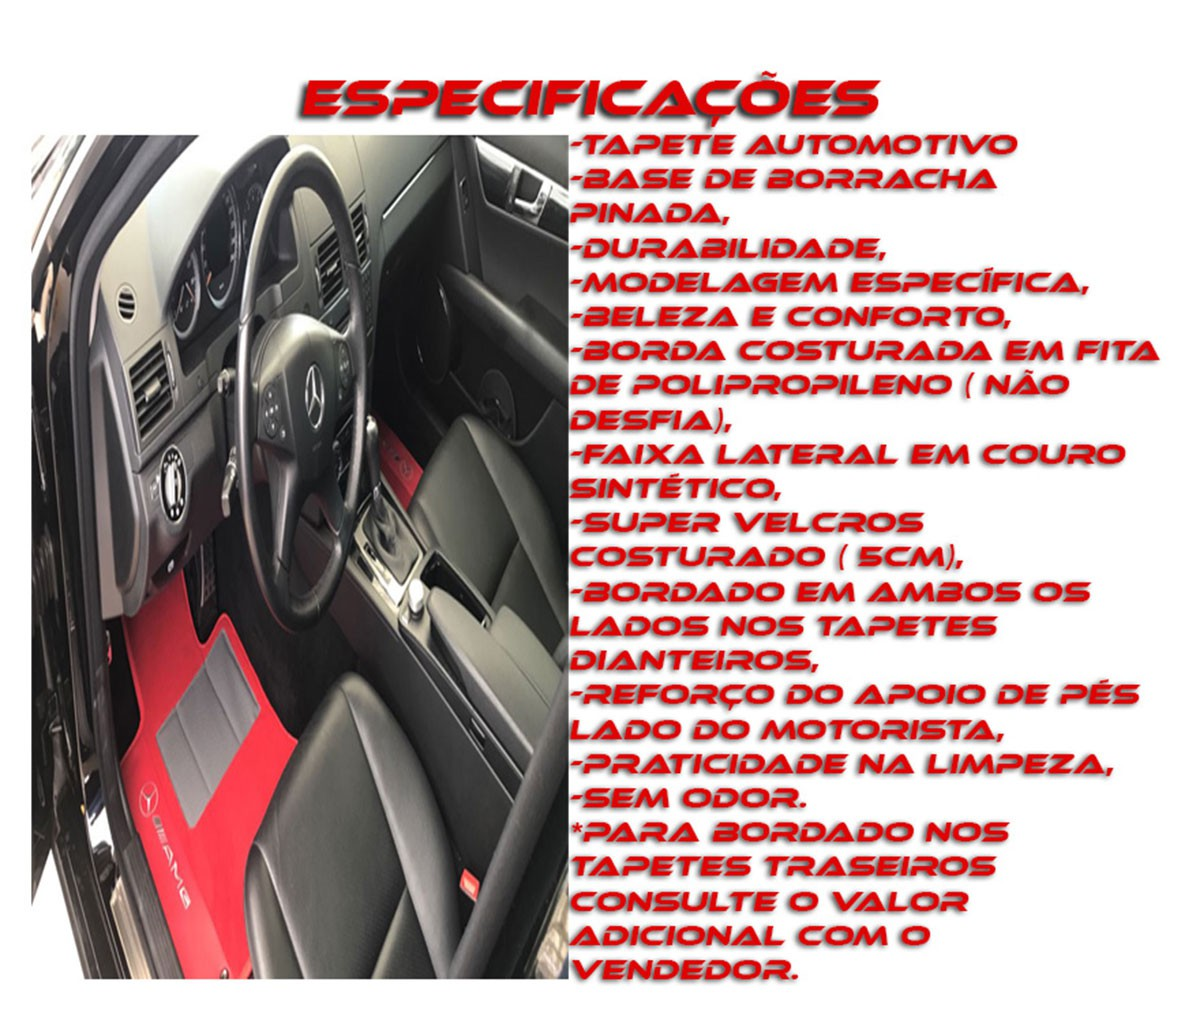 Kit De Tapetes Assoalho Luxo+Porta Malas Preto Fusion